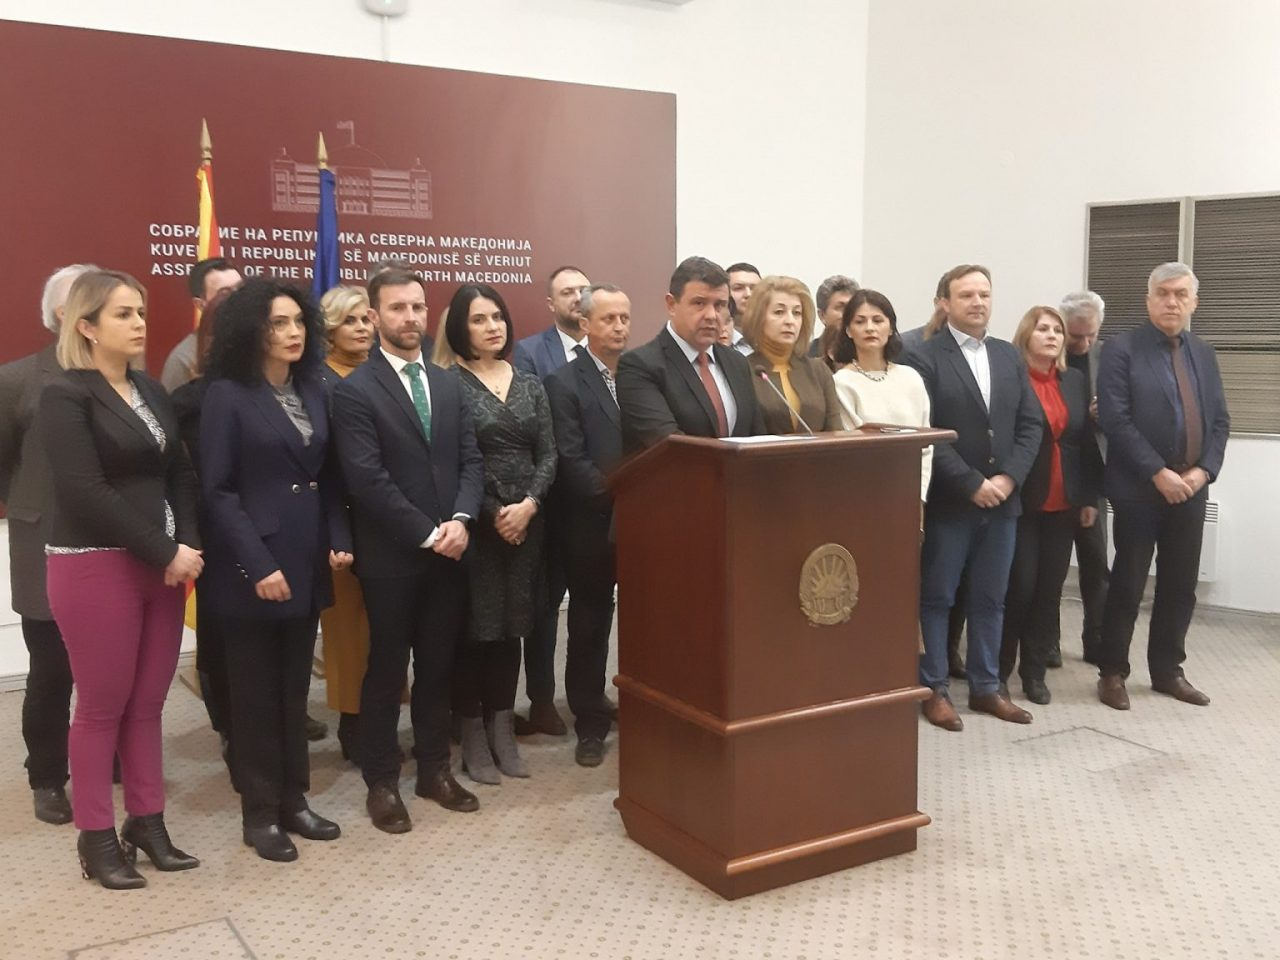 VMRO-Grupi-Parlamentar-1536x1152-1-1280x960.jpg